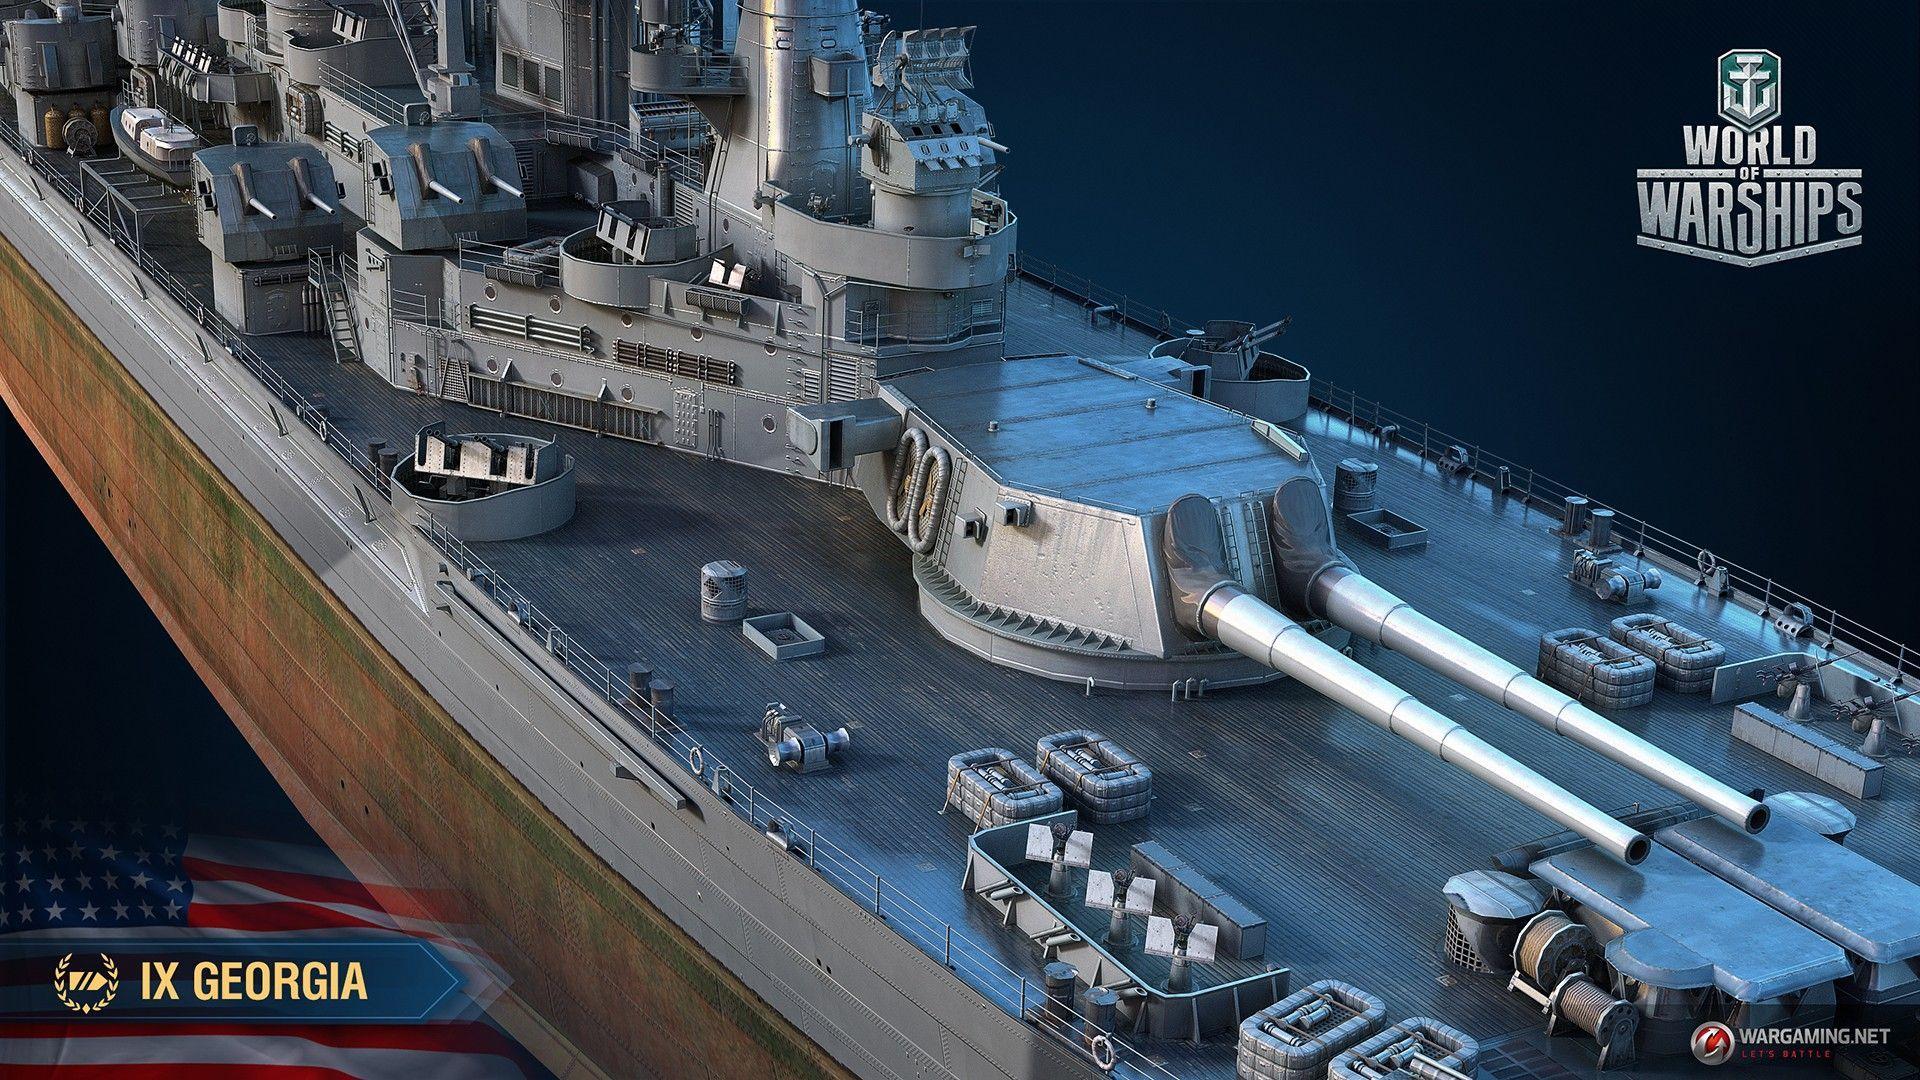 Jun 14 Armada: Georgia World of Warships - WoWs Admiral